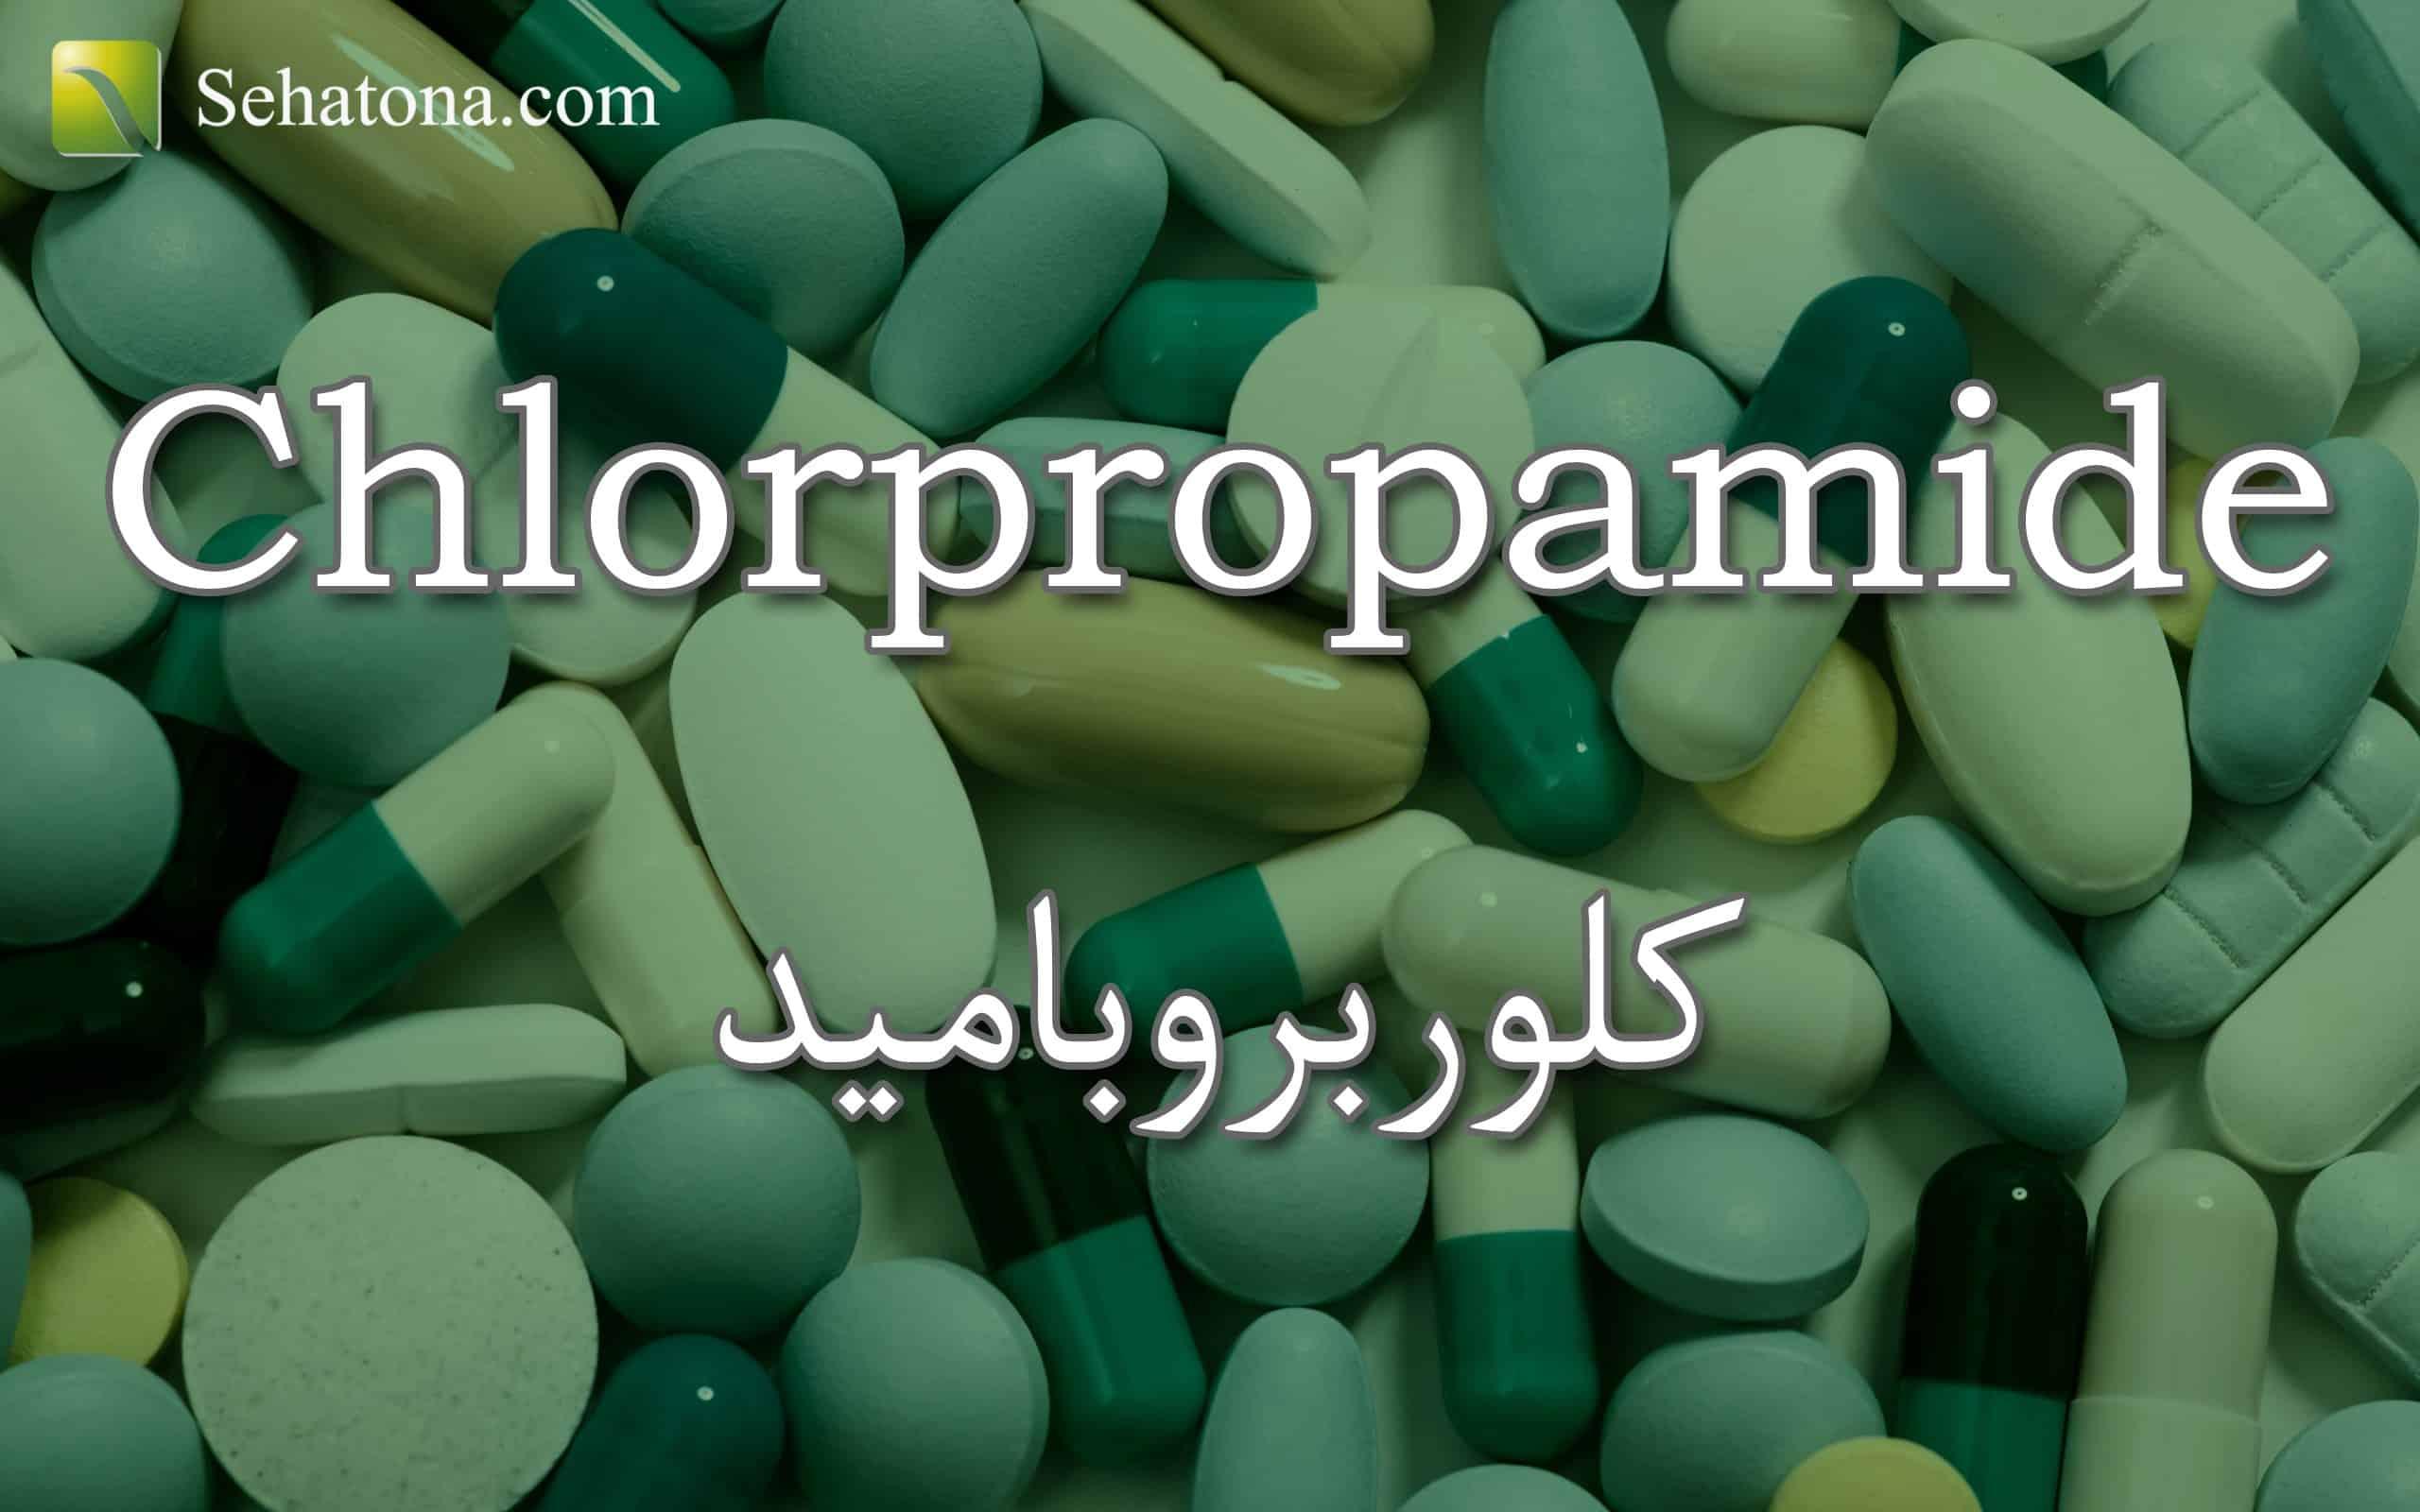 Chlorpropamide